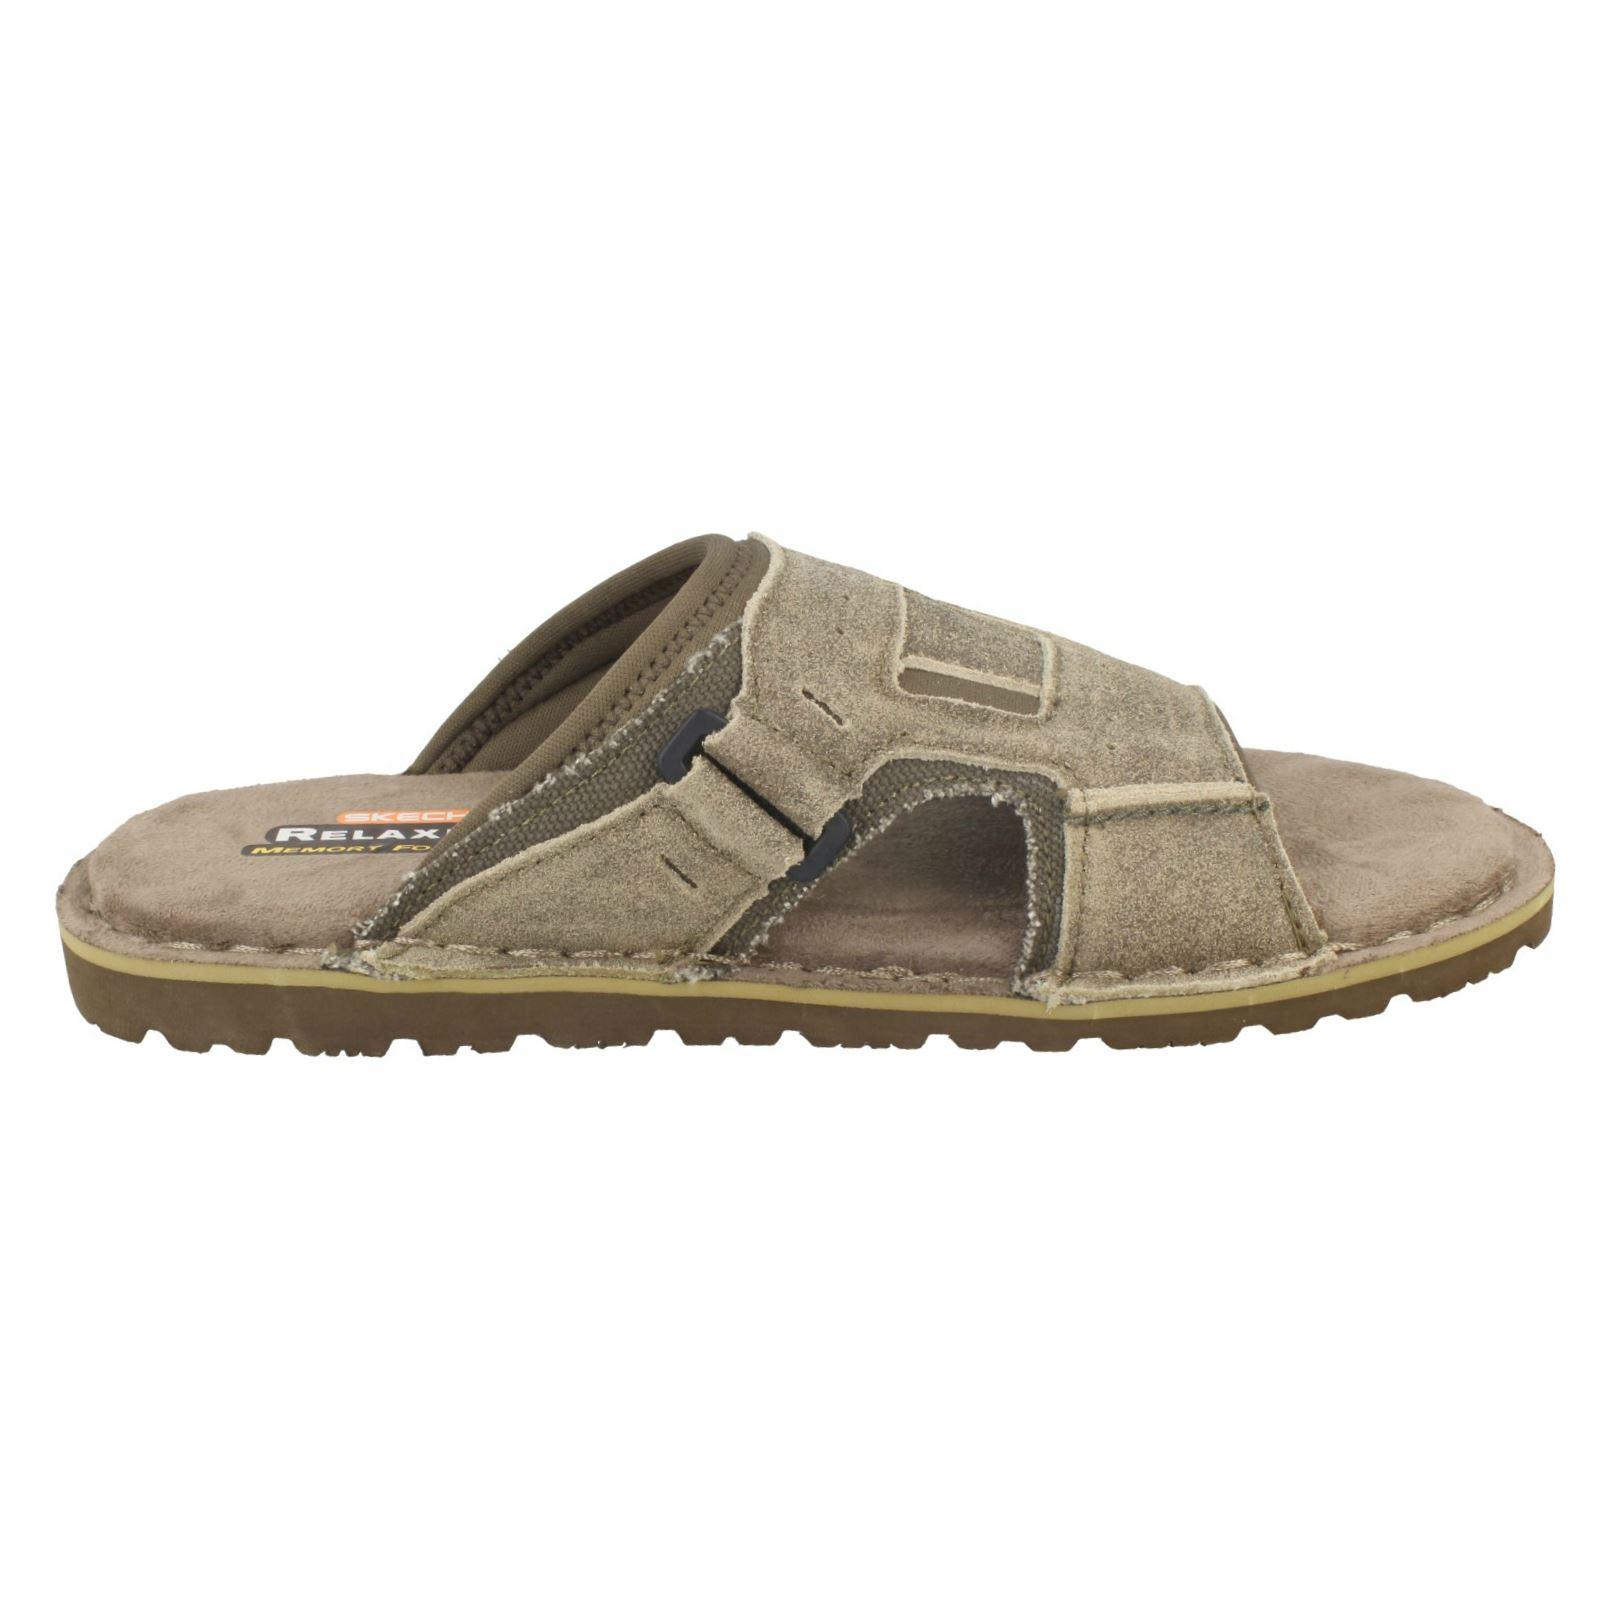 8bc61db69e83 Mens-Skechers-Memory-Foam-Sandals-Golson-64148 thumbnail 16